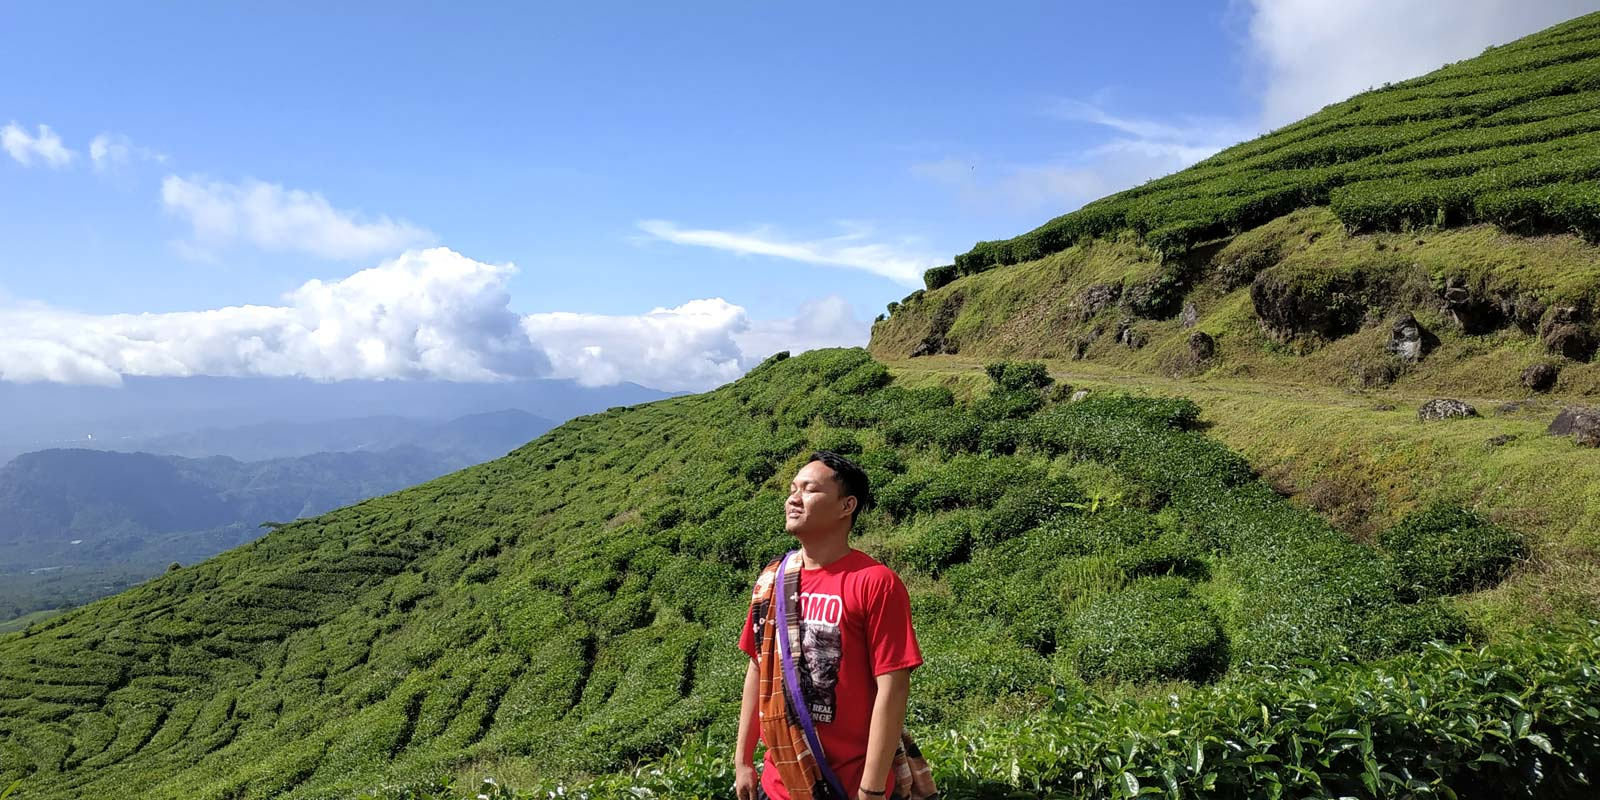 Ritual Kemah Tahunan Di Kaki Gunung Dempo Pagar Alam